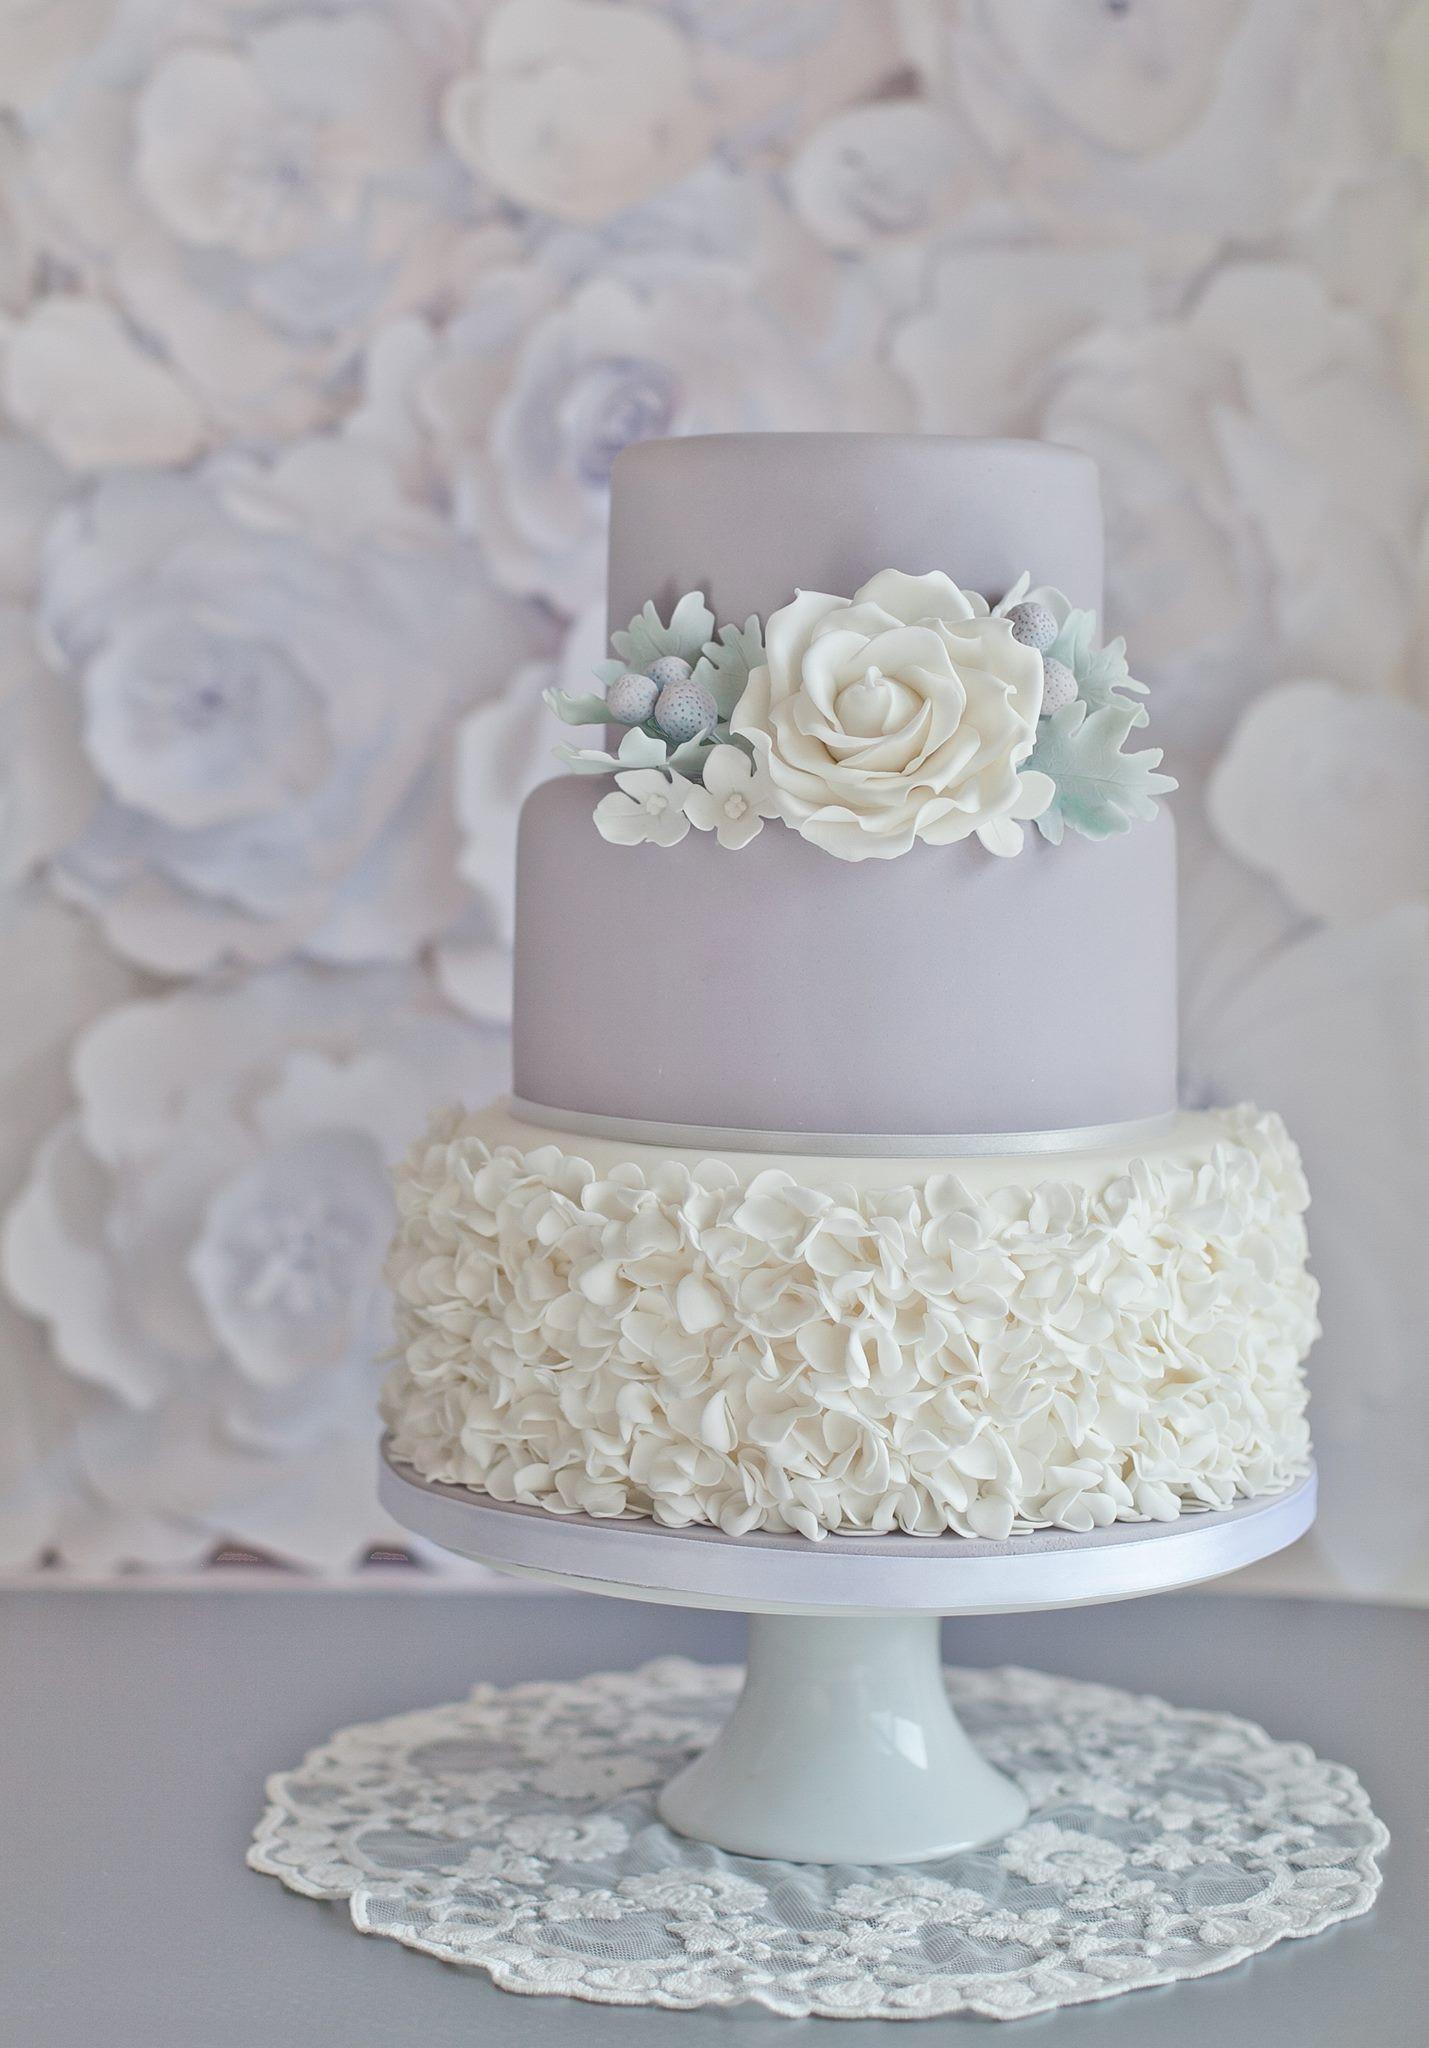 Wedding Cakes Ideas  Delicate Wedding Cakes MODwedding